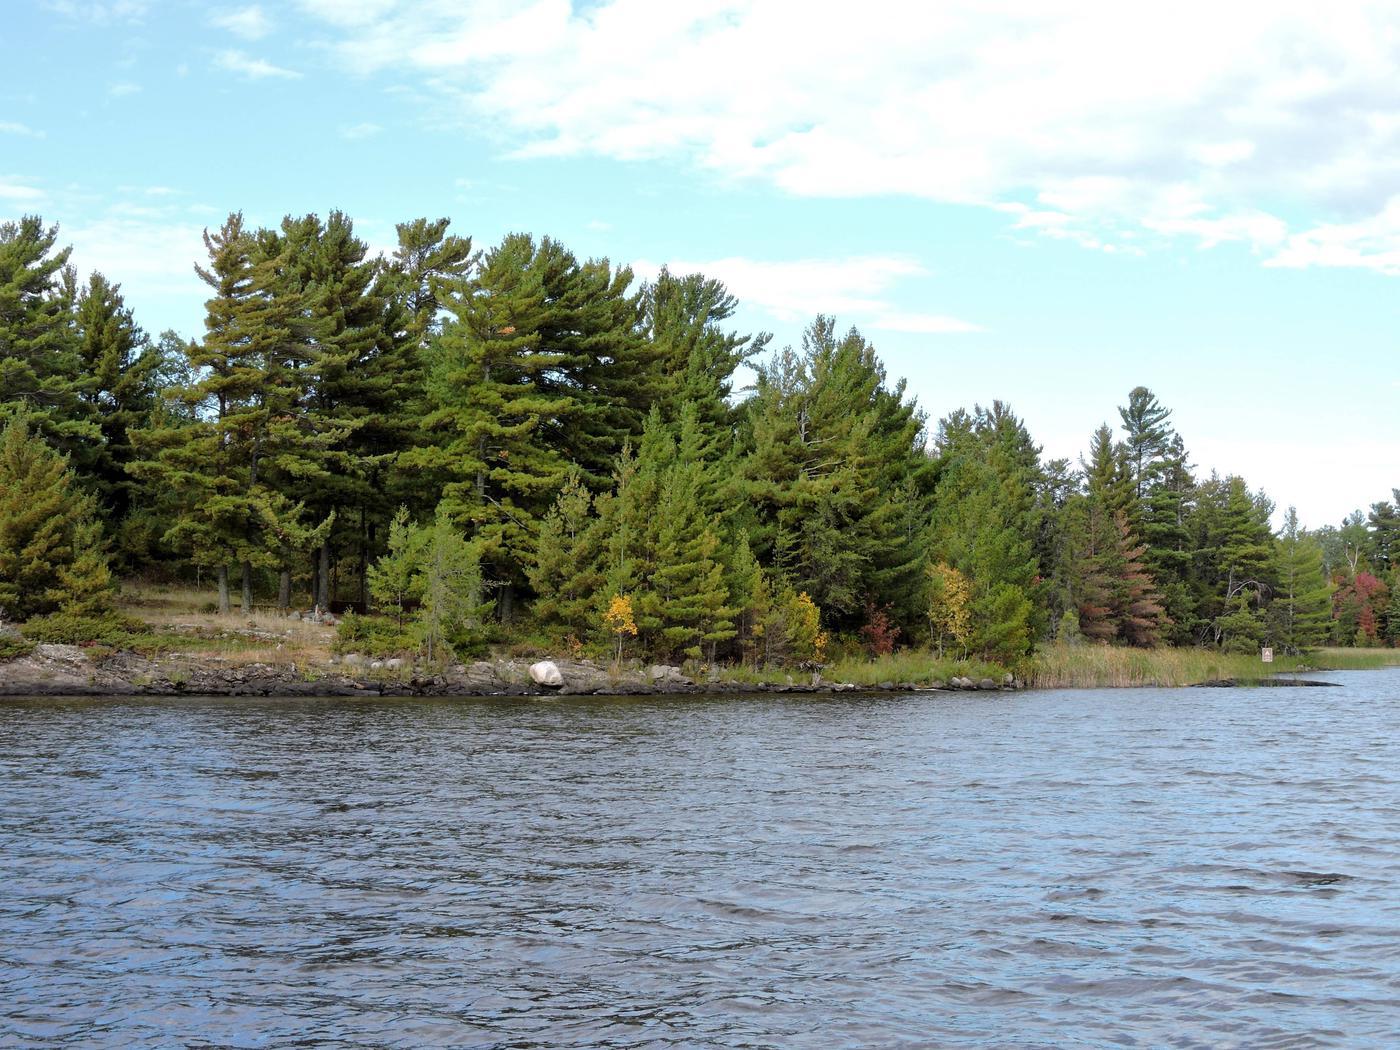 R65 - Reuter CreekR65 - Reuter Creek campsite on Rainy Lake